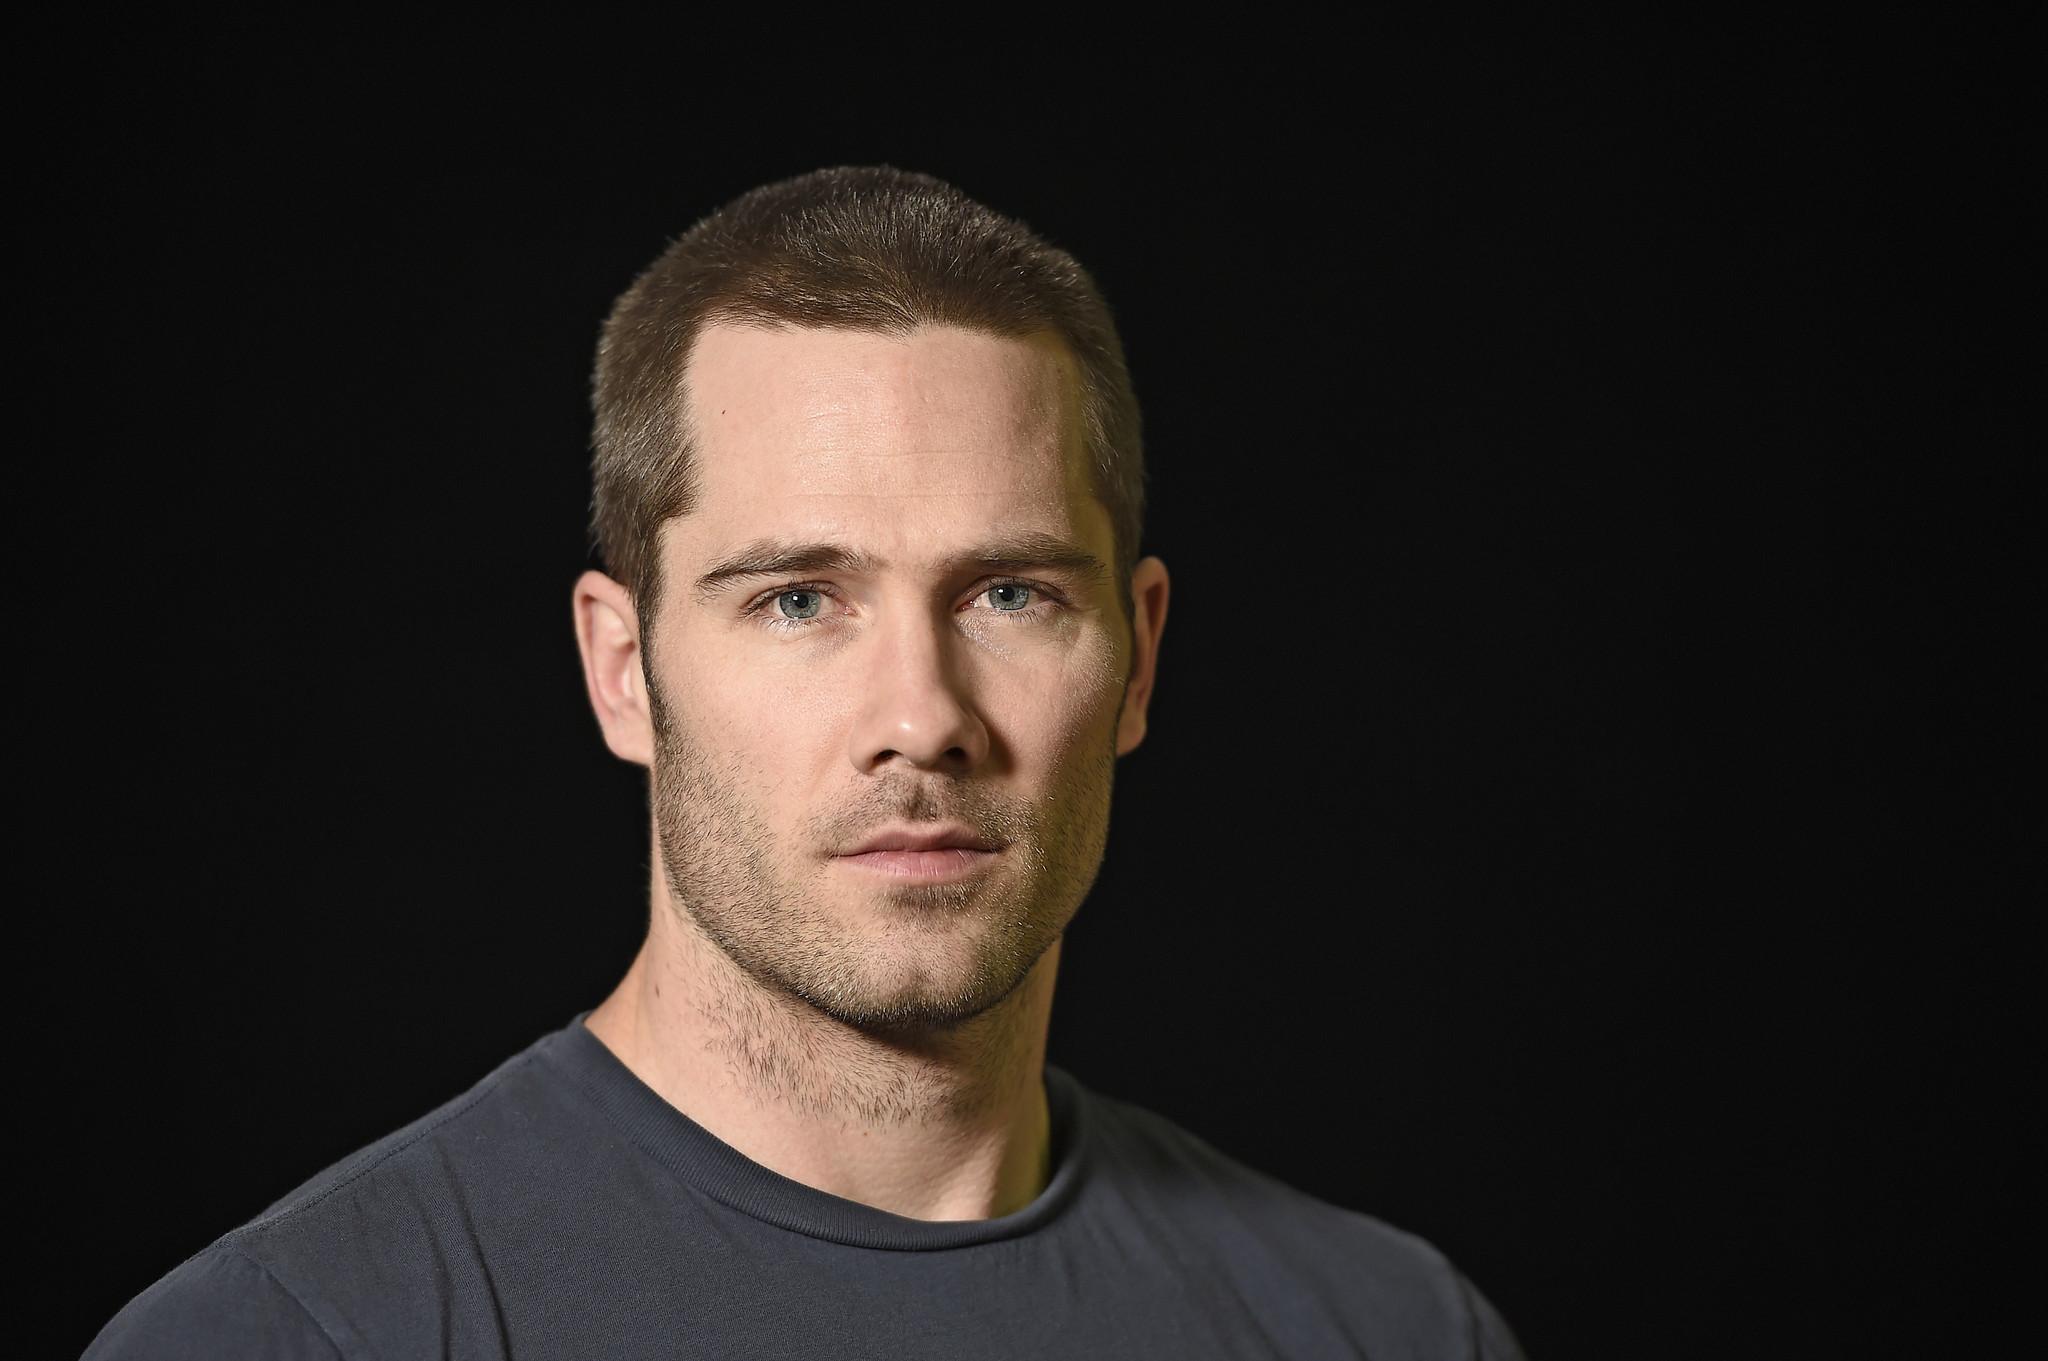 Luke Macfarlane came out as gay in 2008